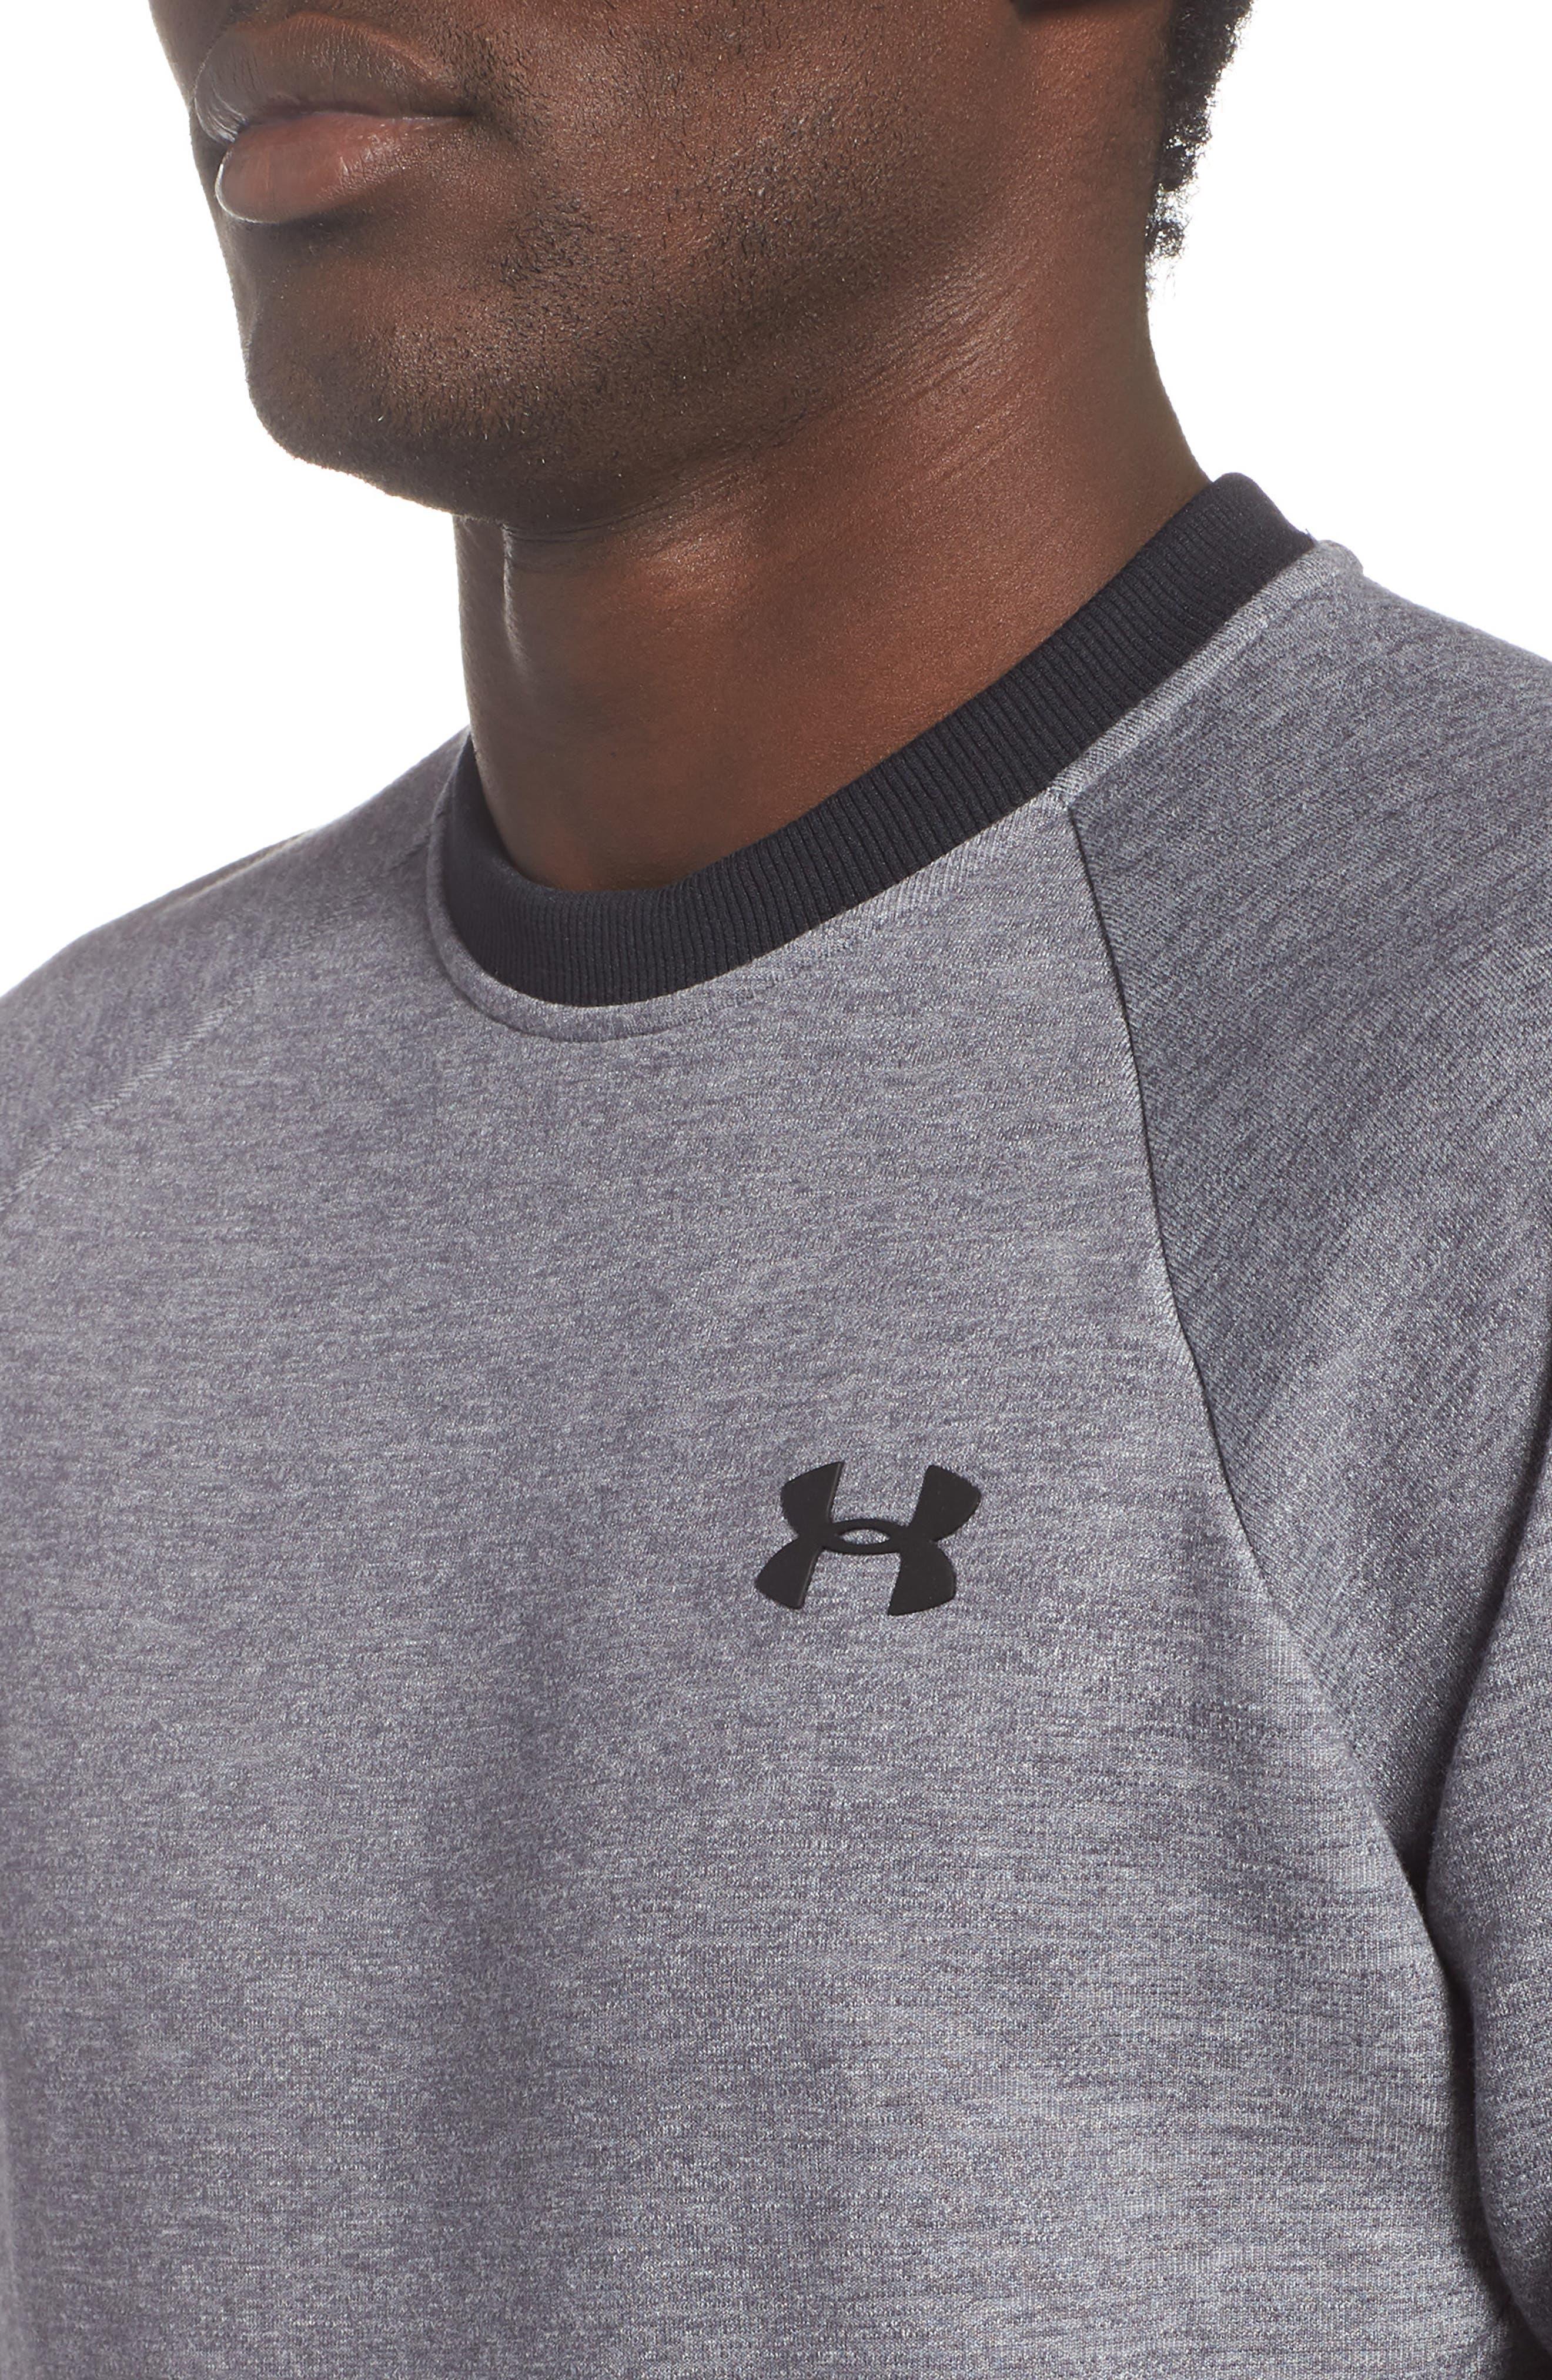 UNDER ARMOUR,                             Sportstyle 2x Crew Sweatshirt,                             Alternate thumbnail 4, color,                             STEEL